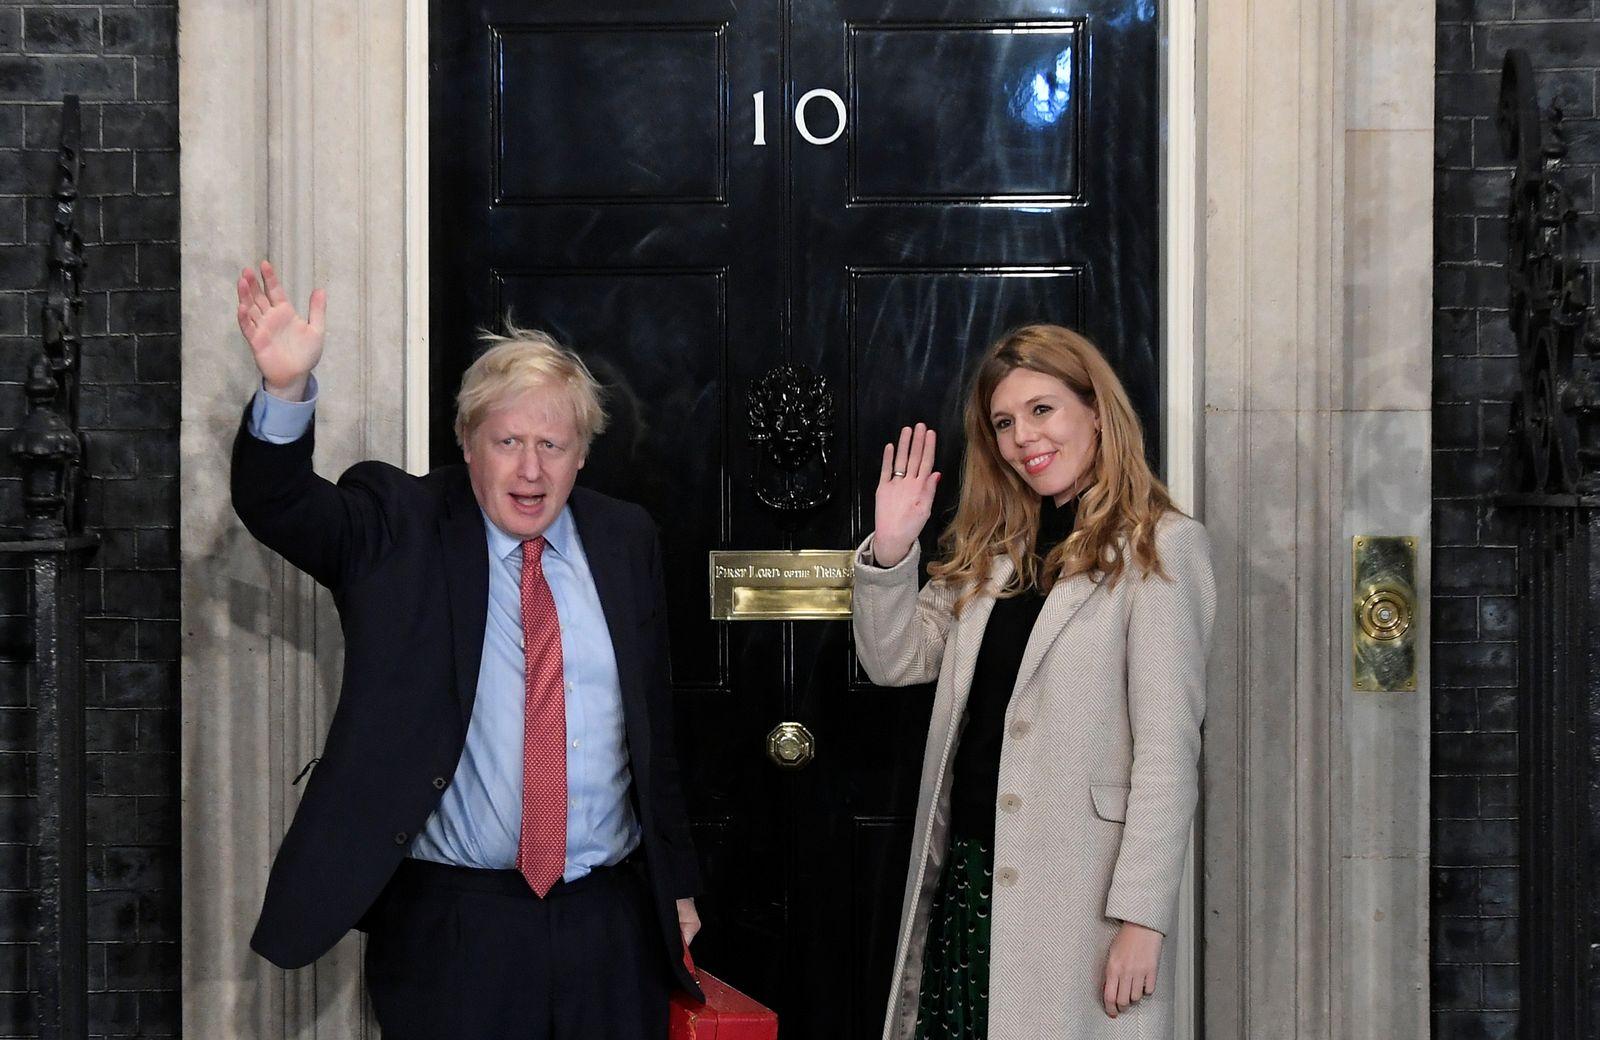 Boris Johnson / Carrie Symonds